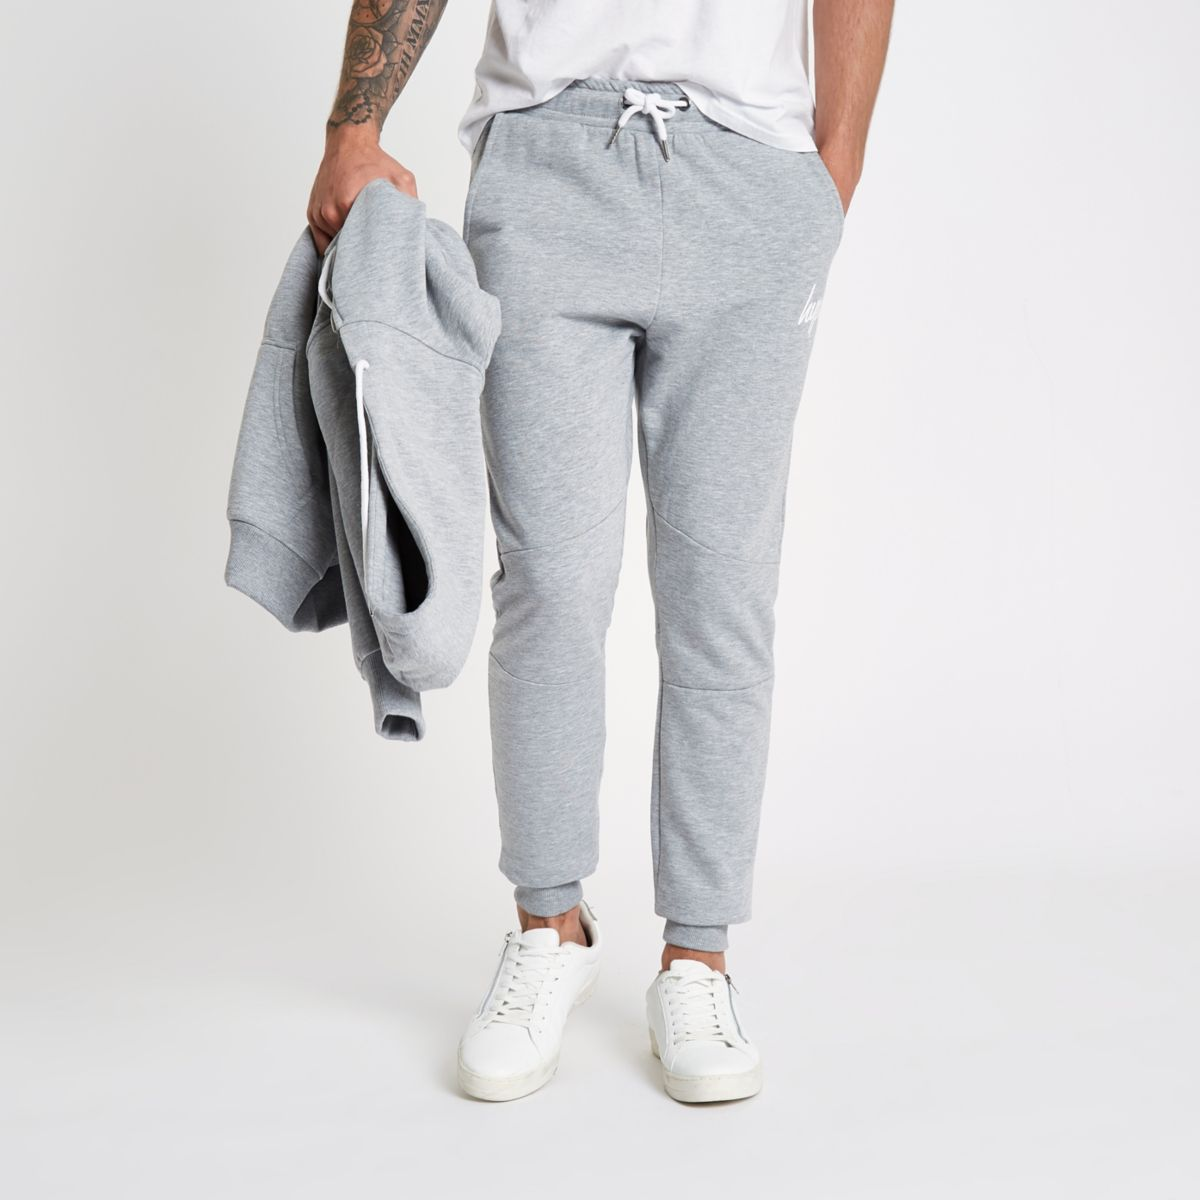 Hype grey joggers